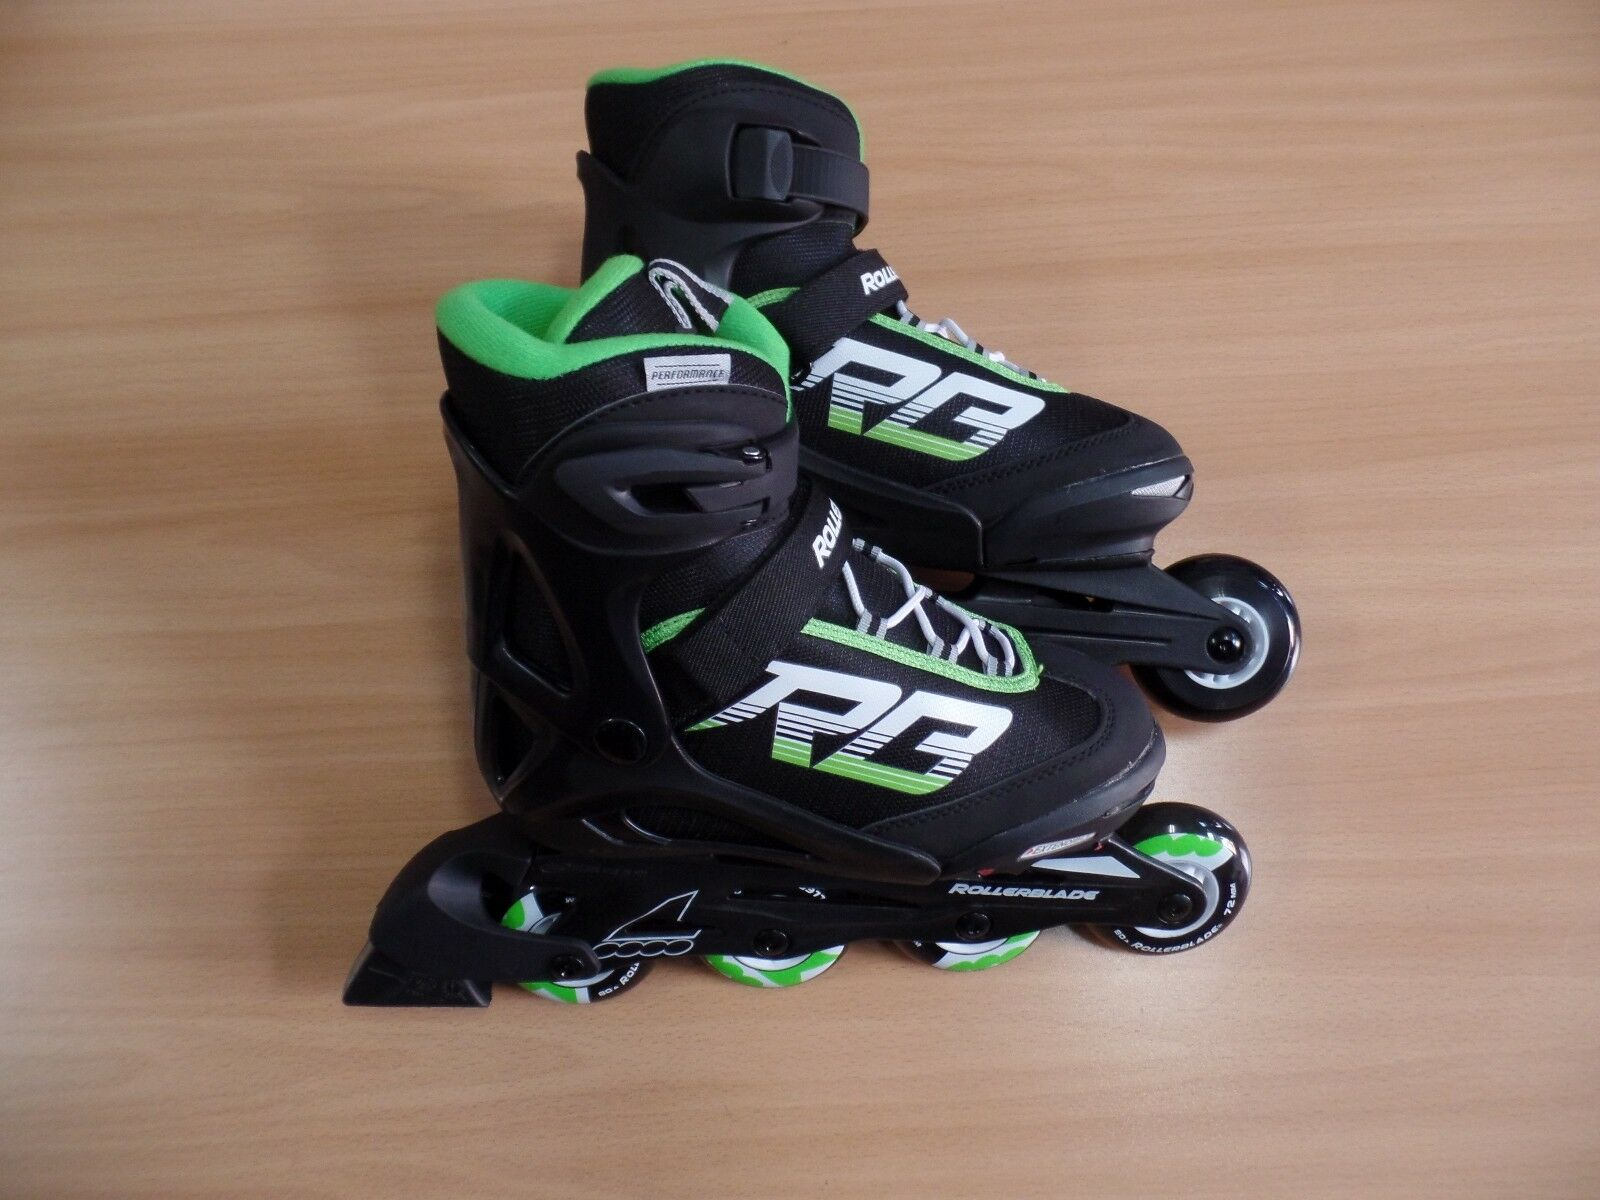 Rollerblade - Junior - Kids - Skates -   Inliner  - Comet - Gr. 29 - 34   -NEU -